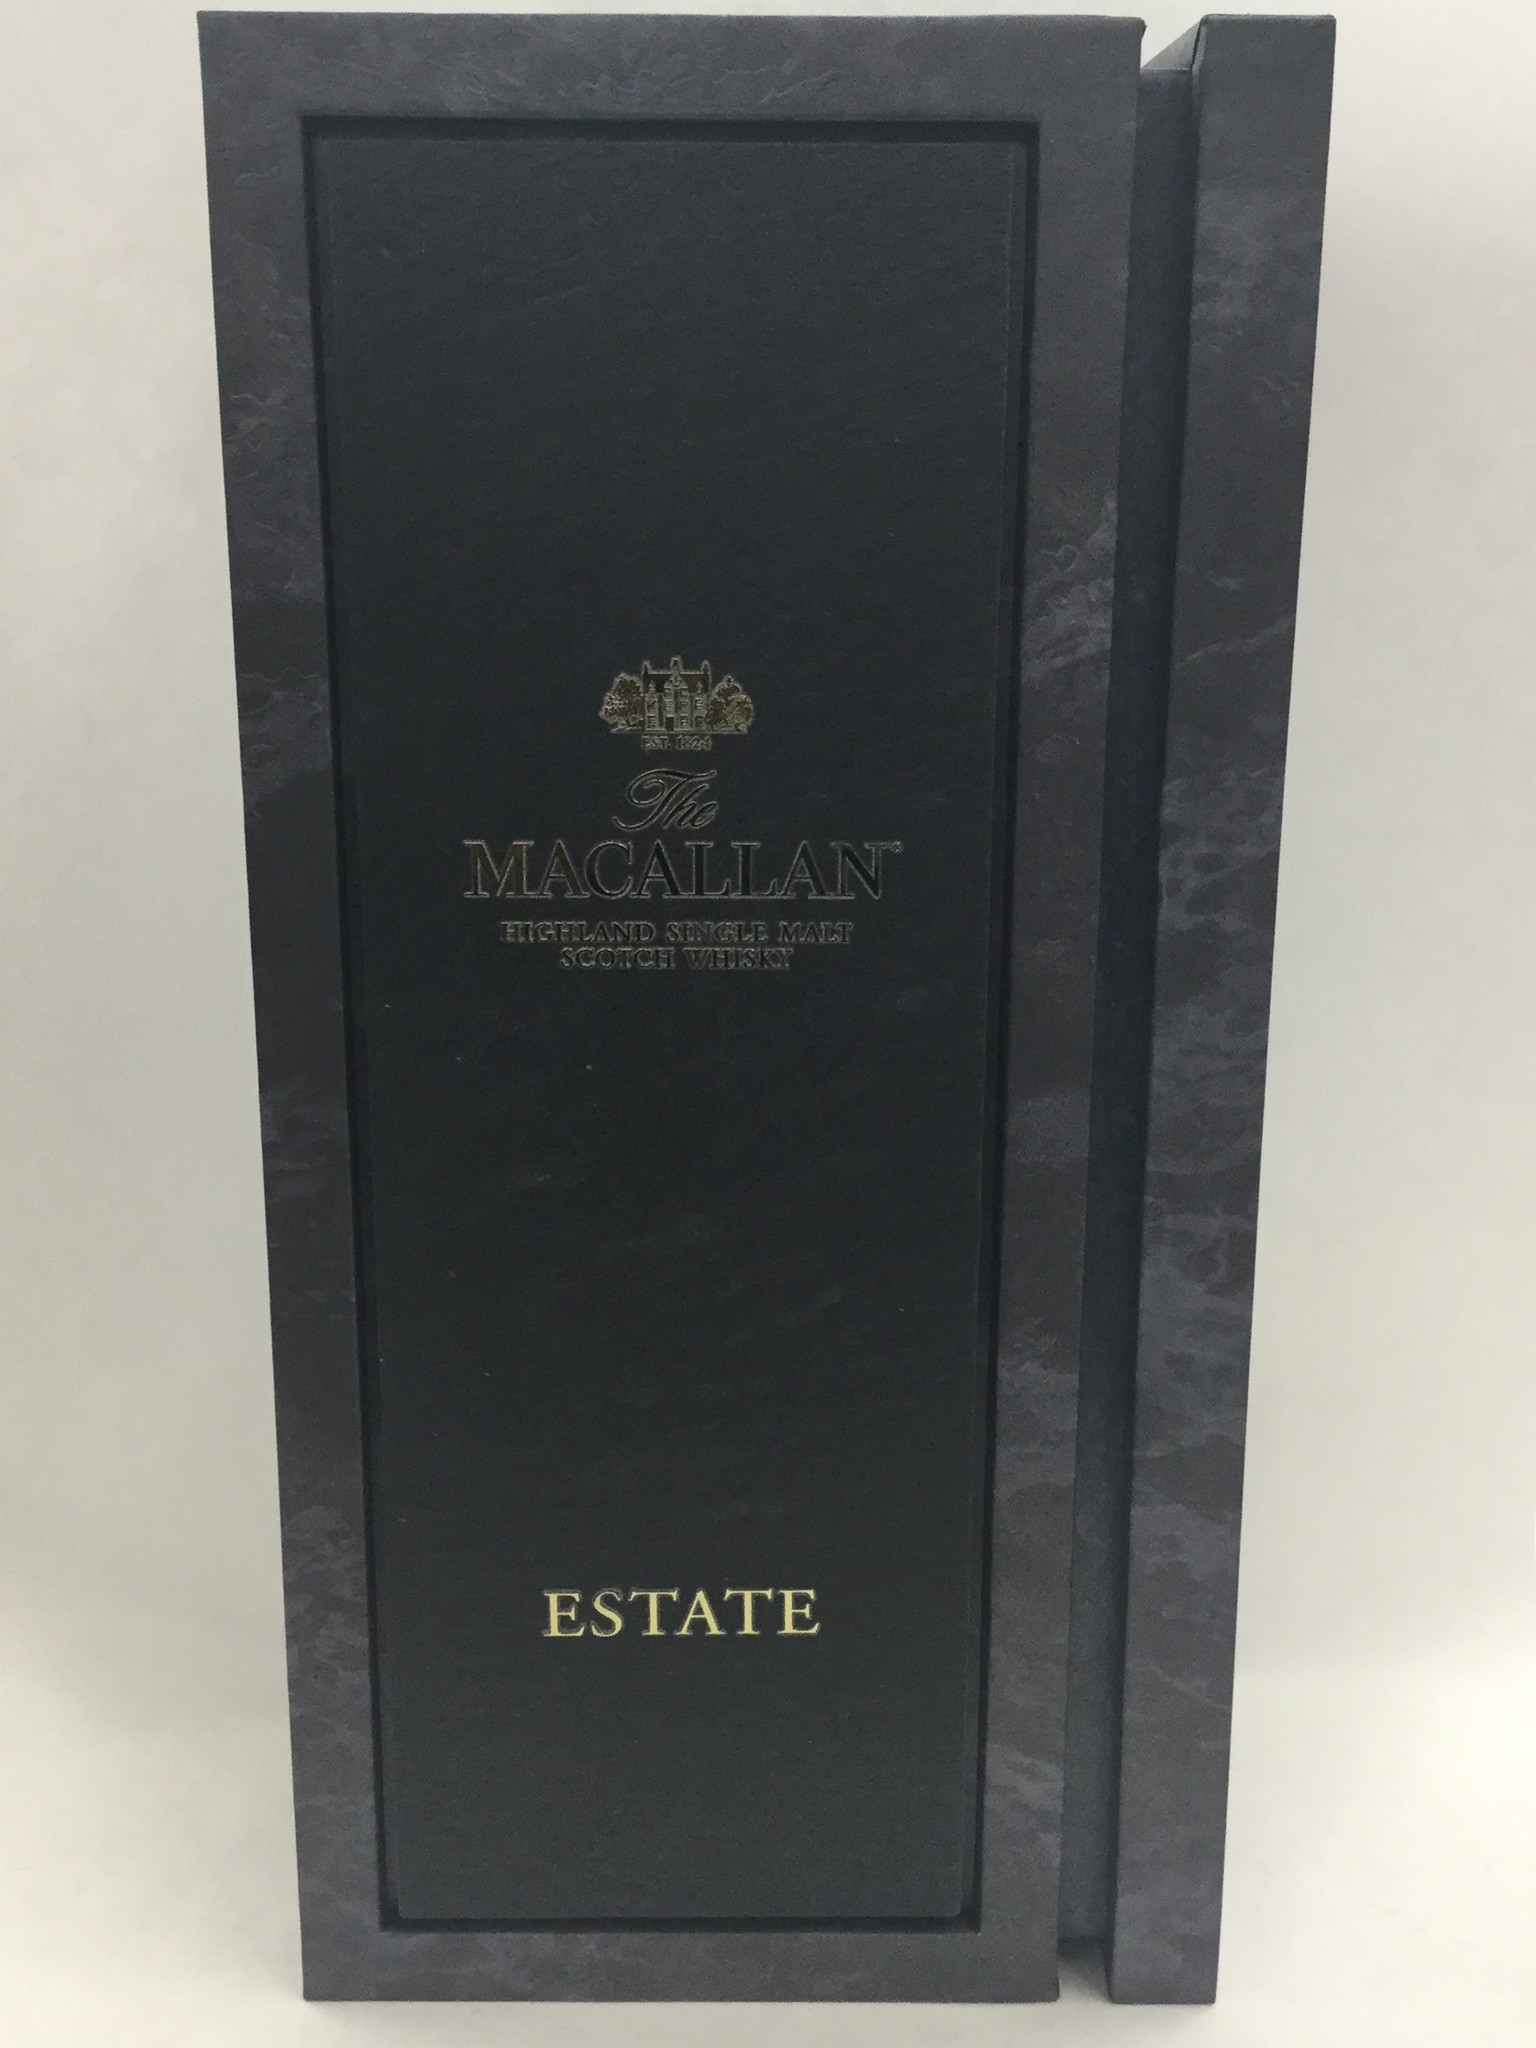 The Macallan Estate Reserve Highland Single Malt Scotch Whisky 750ml